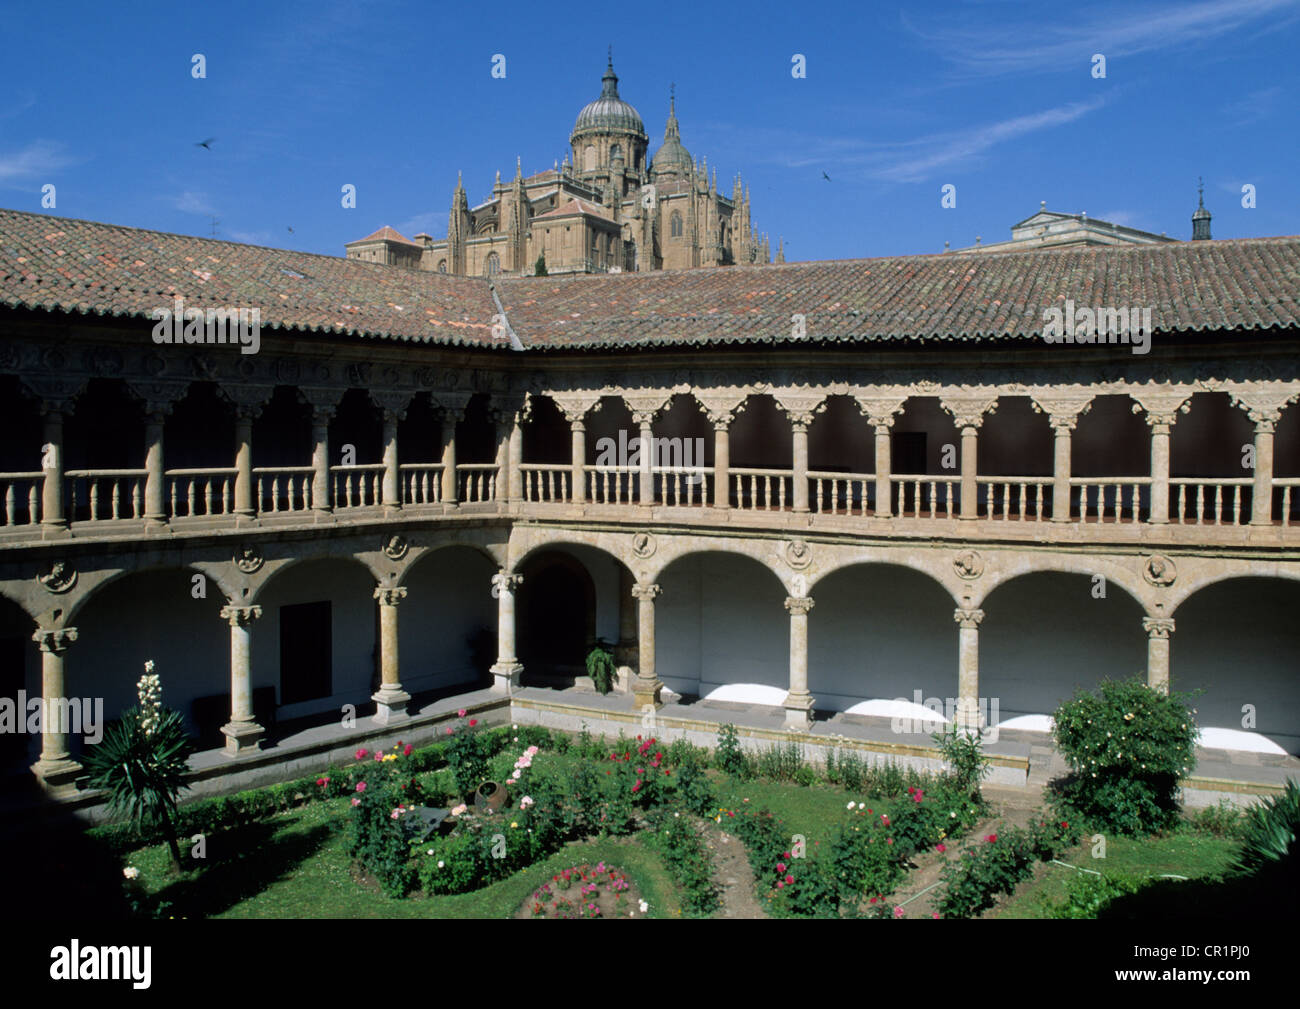 Spain, Castile-Leon, Salamanca, old city UNESCO World Heritage, Las Duenas Convent, its cloister - Stock Image